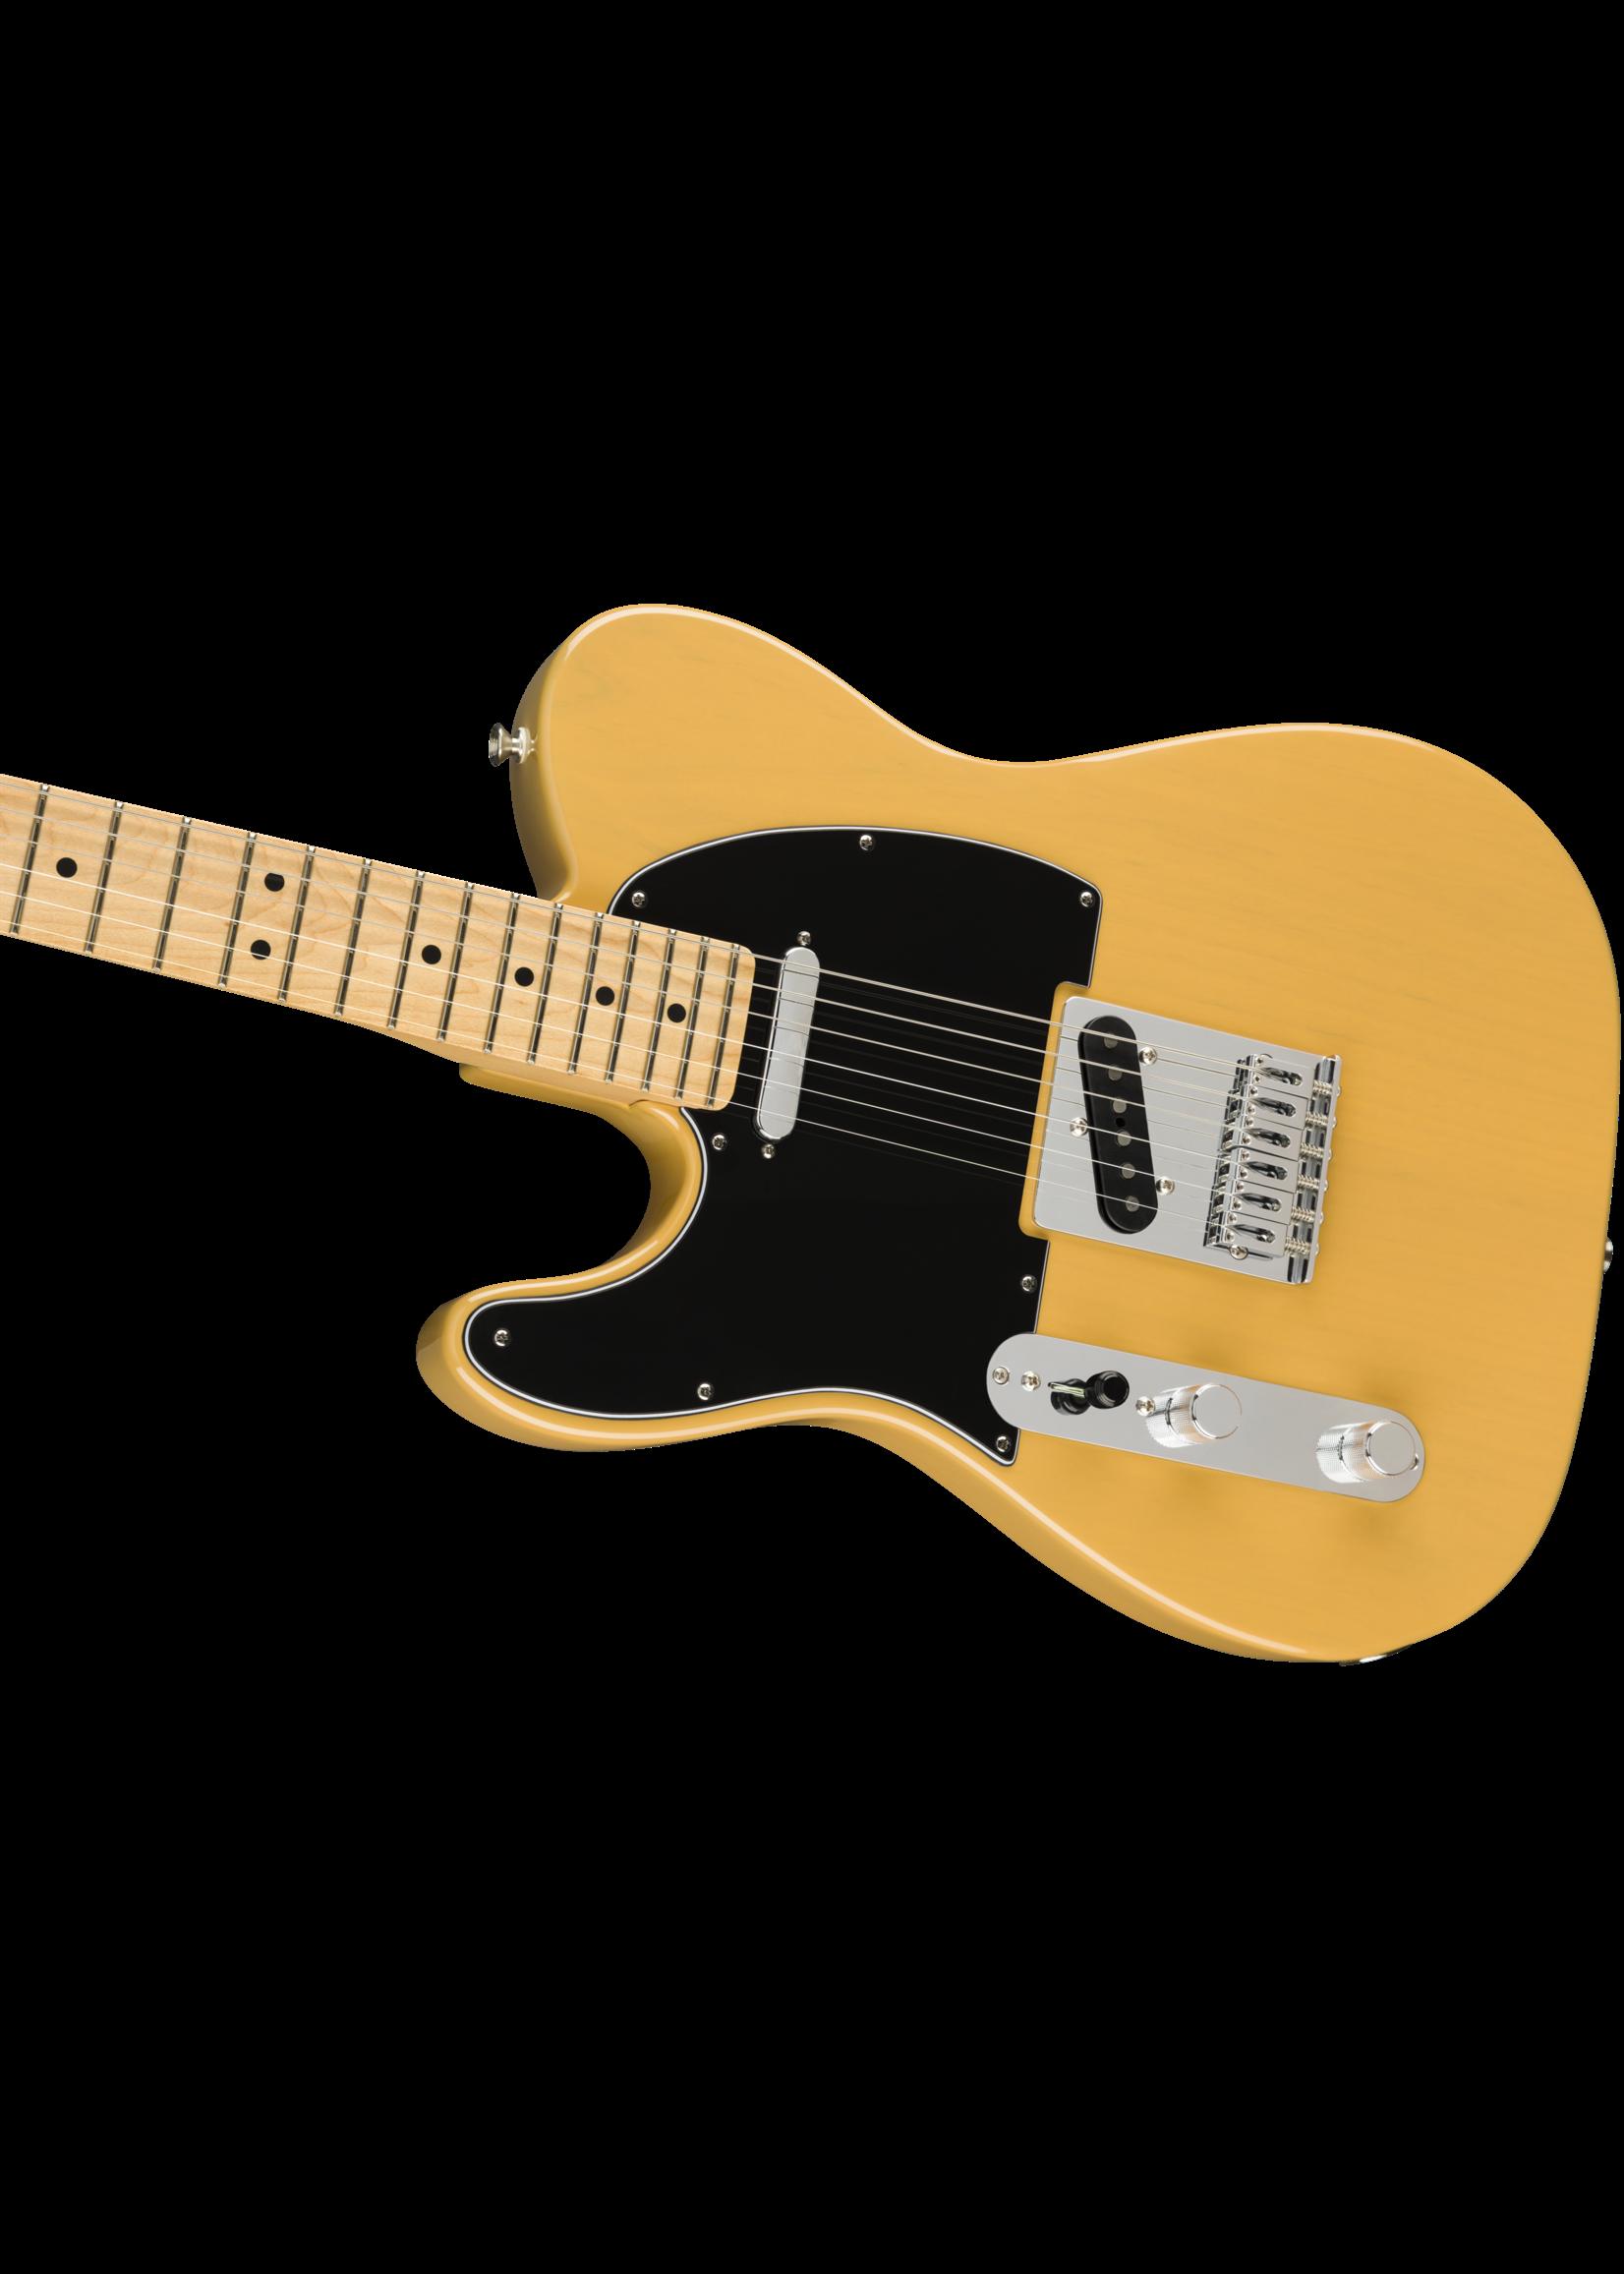 Fender Fender Player Telecaster Left-Handed with Maple Fretboard Butterscotch Blonde